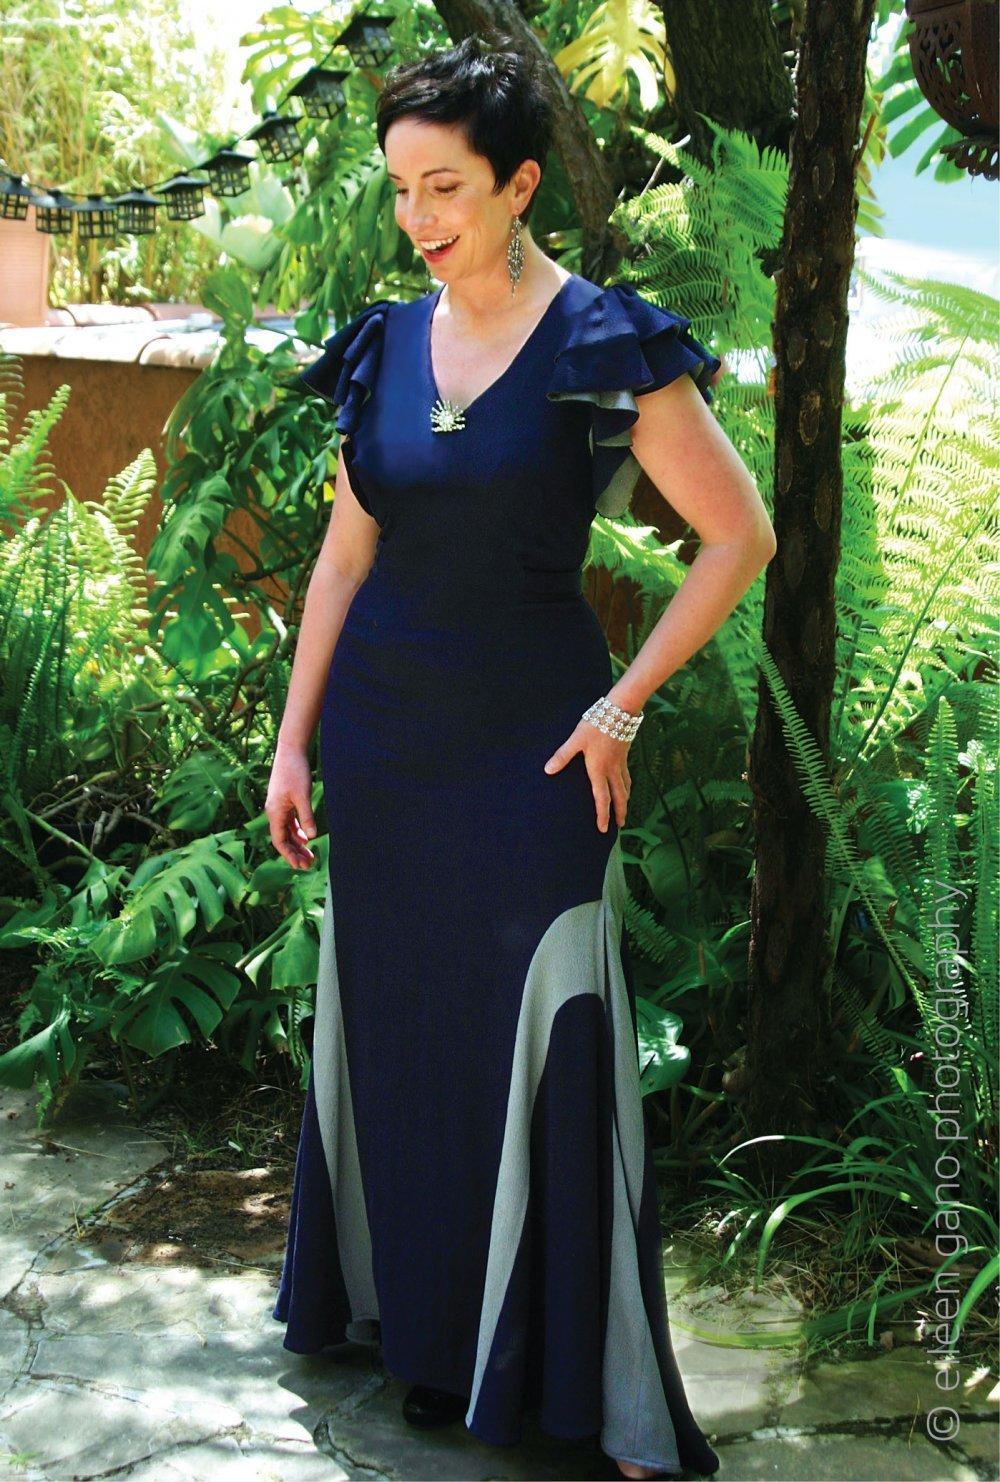 dinah-steward-woman-blue-dress-portrait-eileen-gano